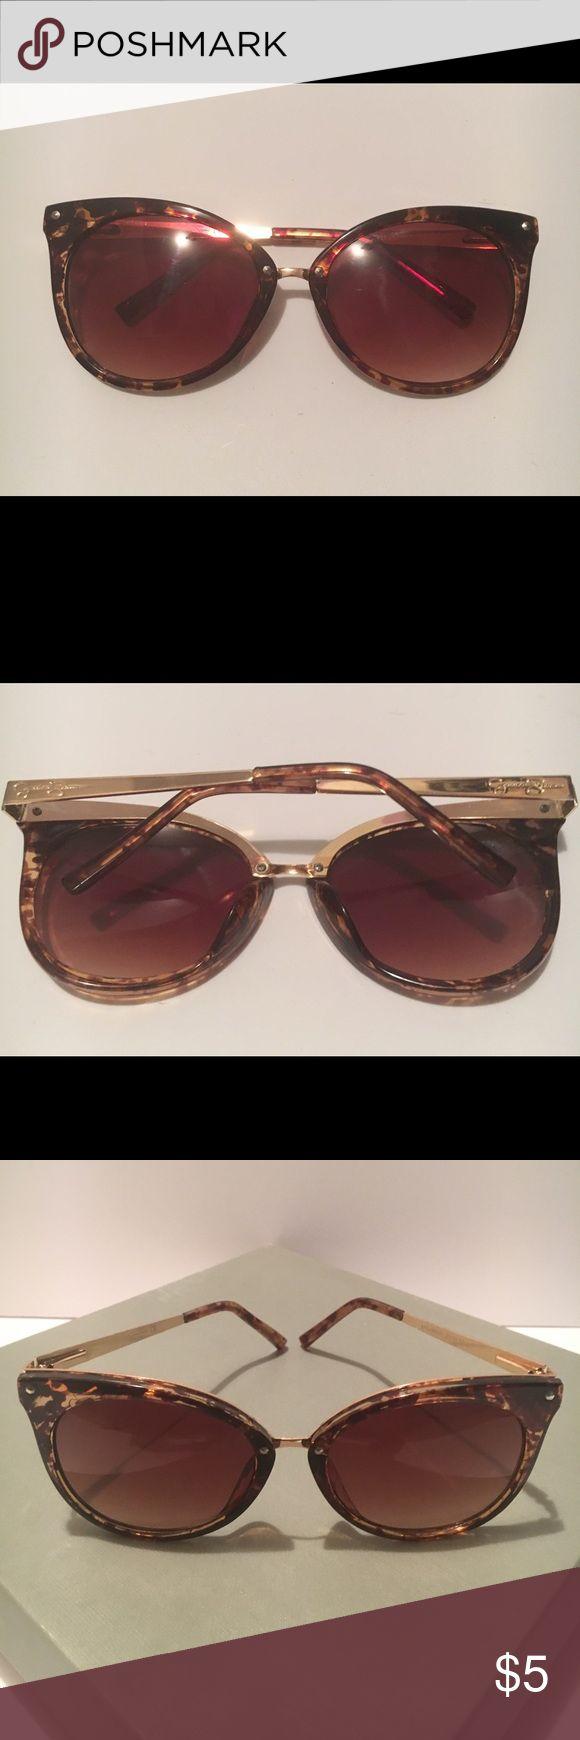 Jessica Simpson Sunglasses Flat Lens Tortoise Sunglasses Jessica Simpson Accessories Sunglasses